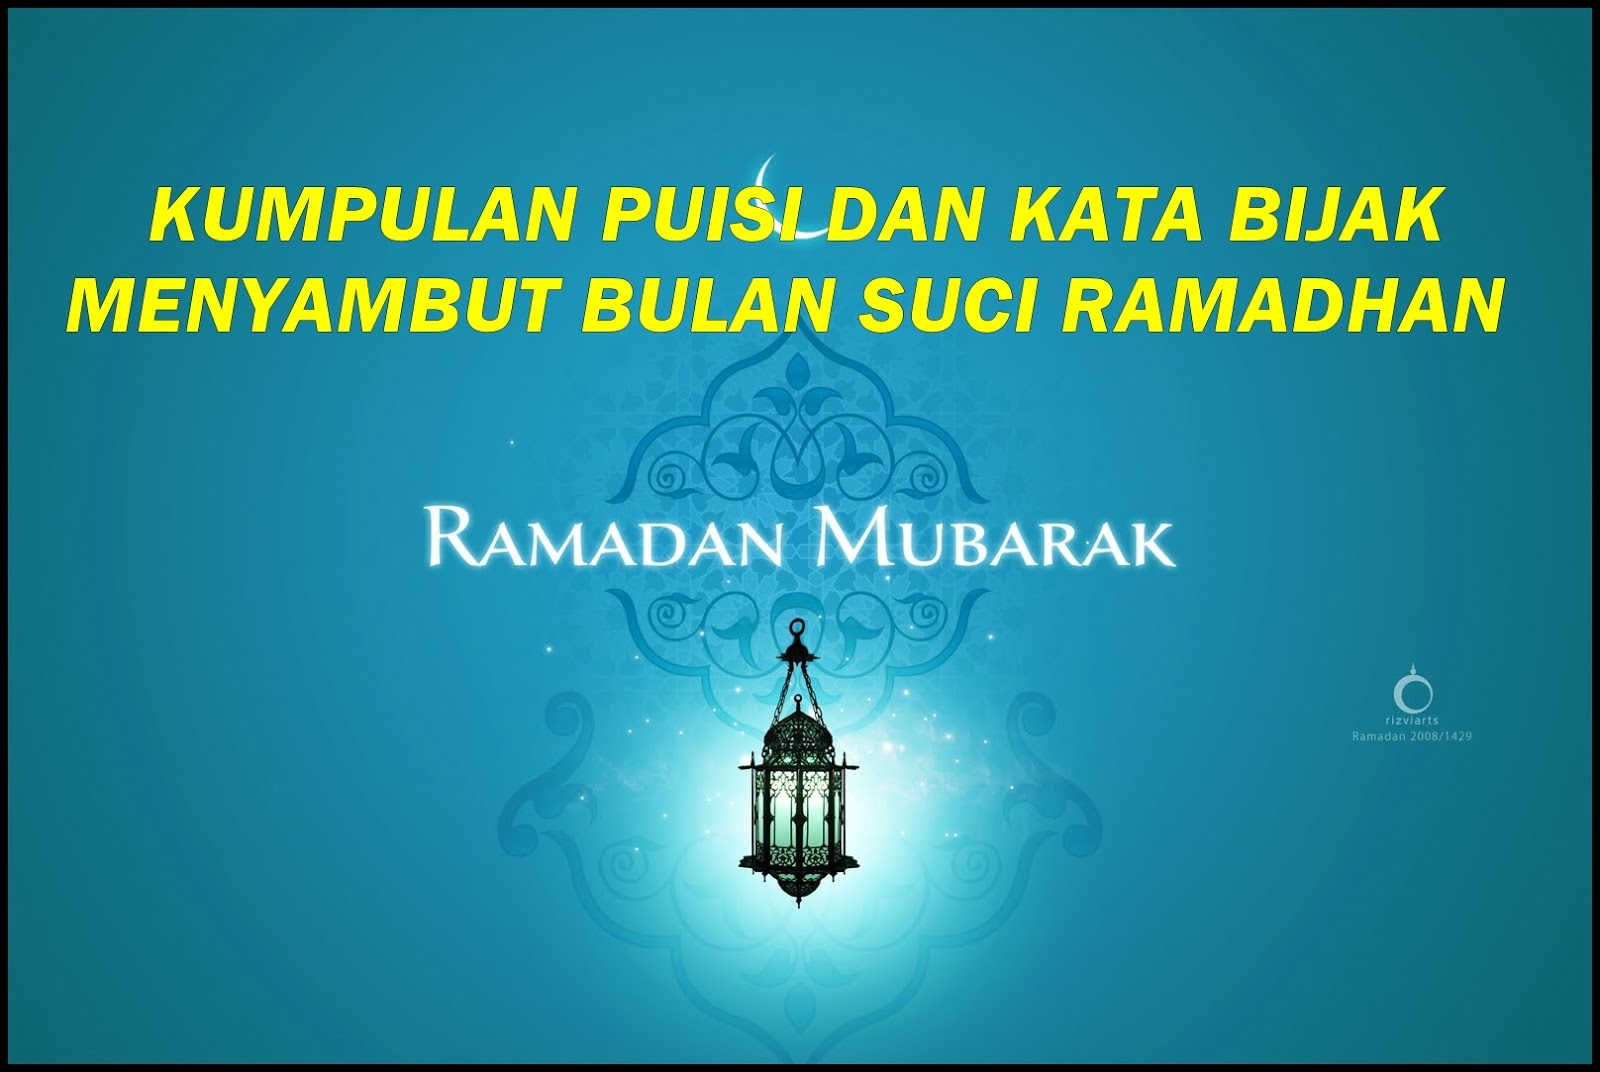 Puisi Dan Kata Mutiara Menyambut Bulan Suci Ramadhan ...